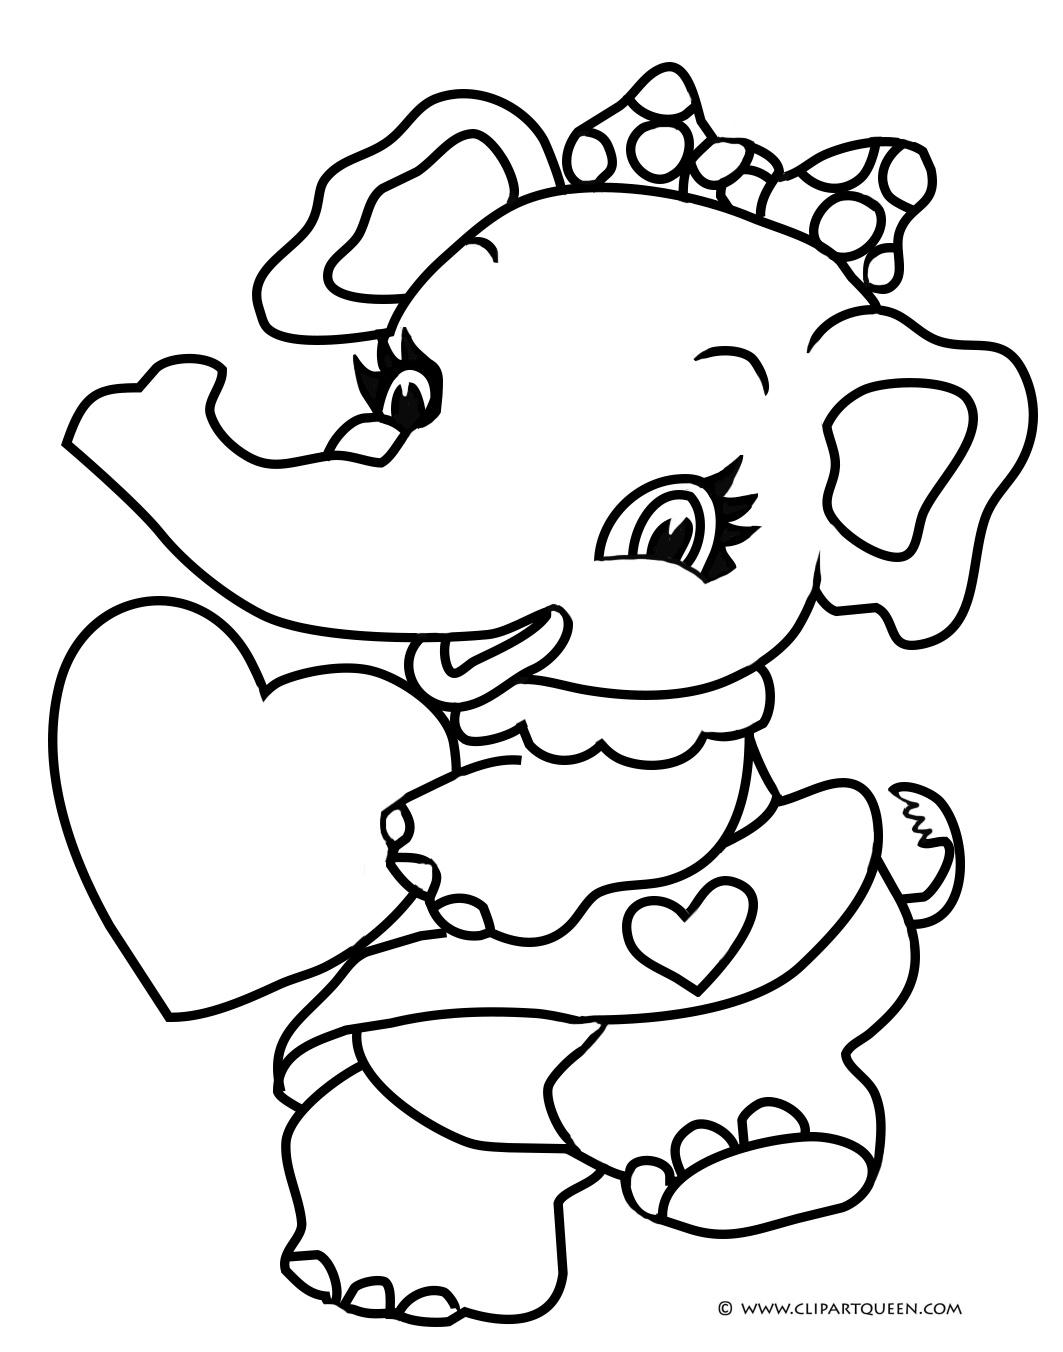 1063x1352 Cute Elephant With Heart